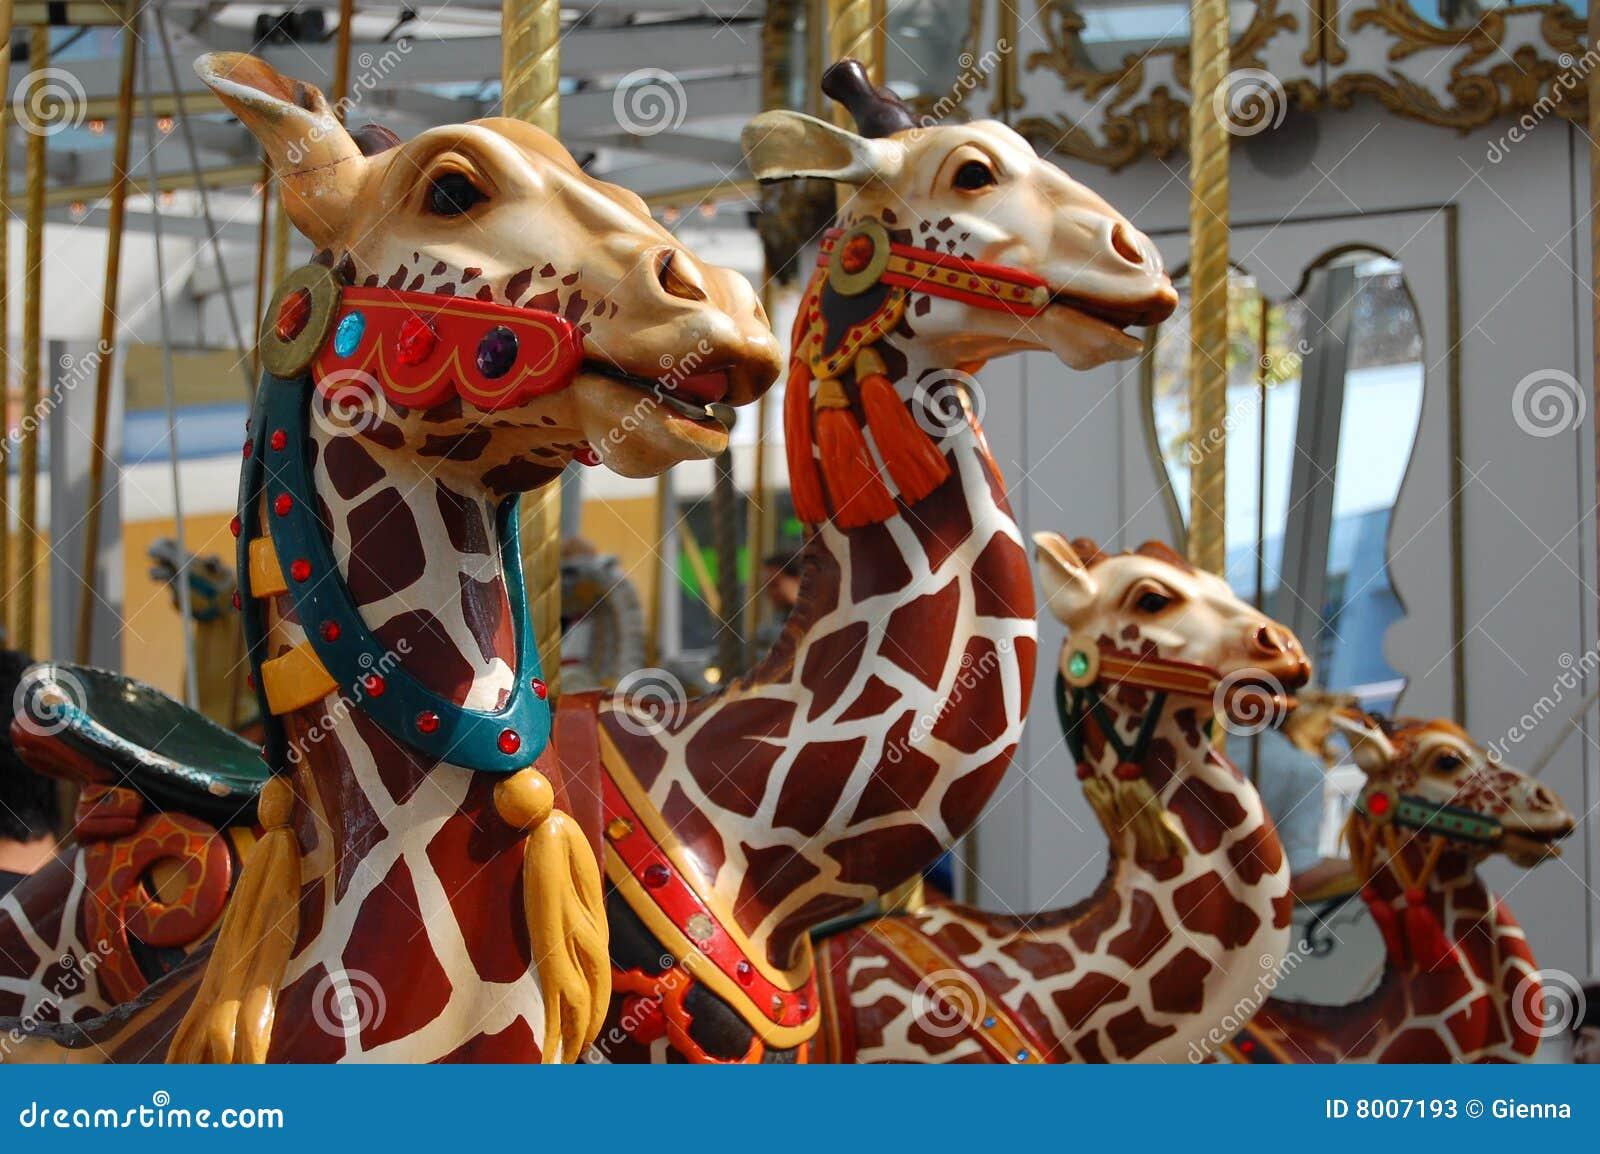 carousel animals stock photos image 8007193